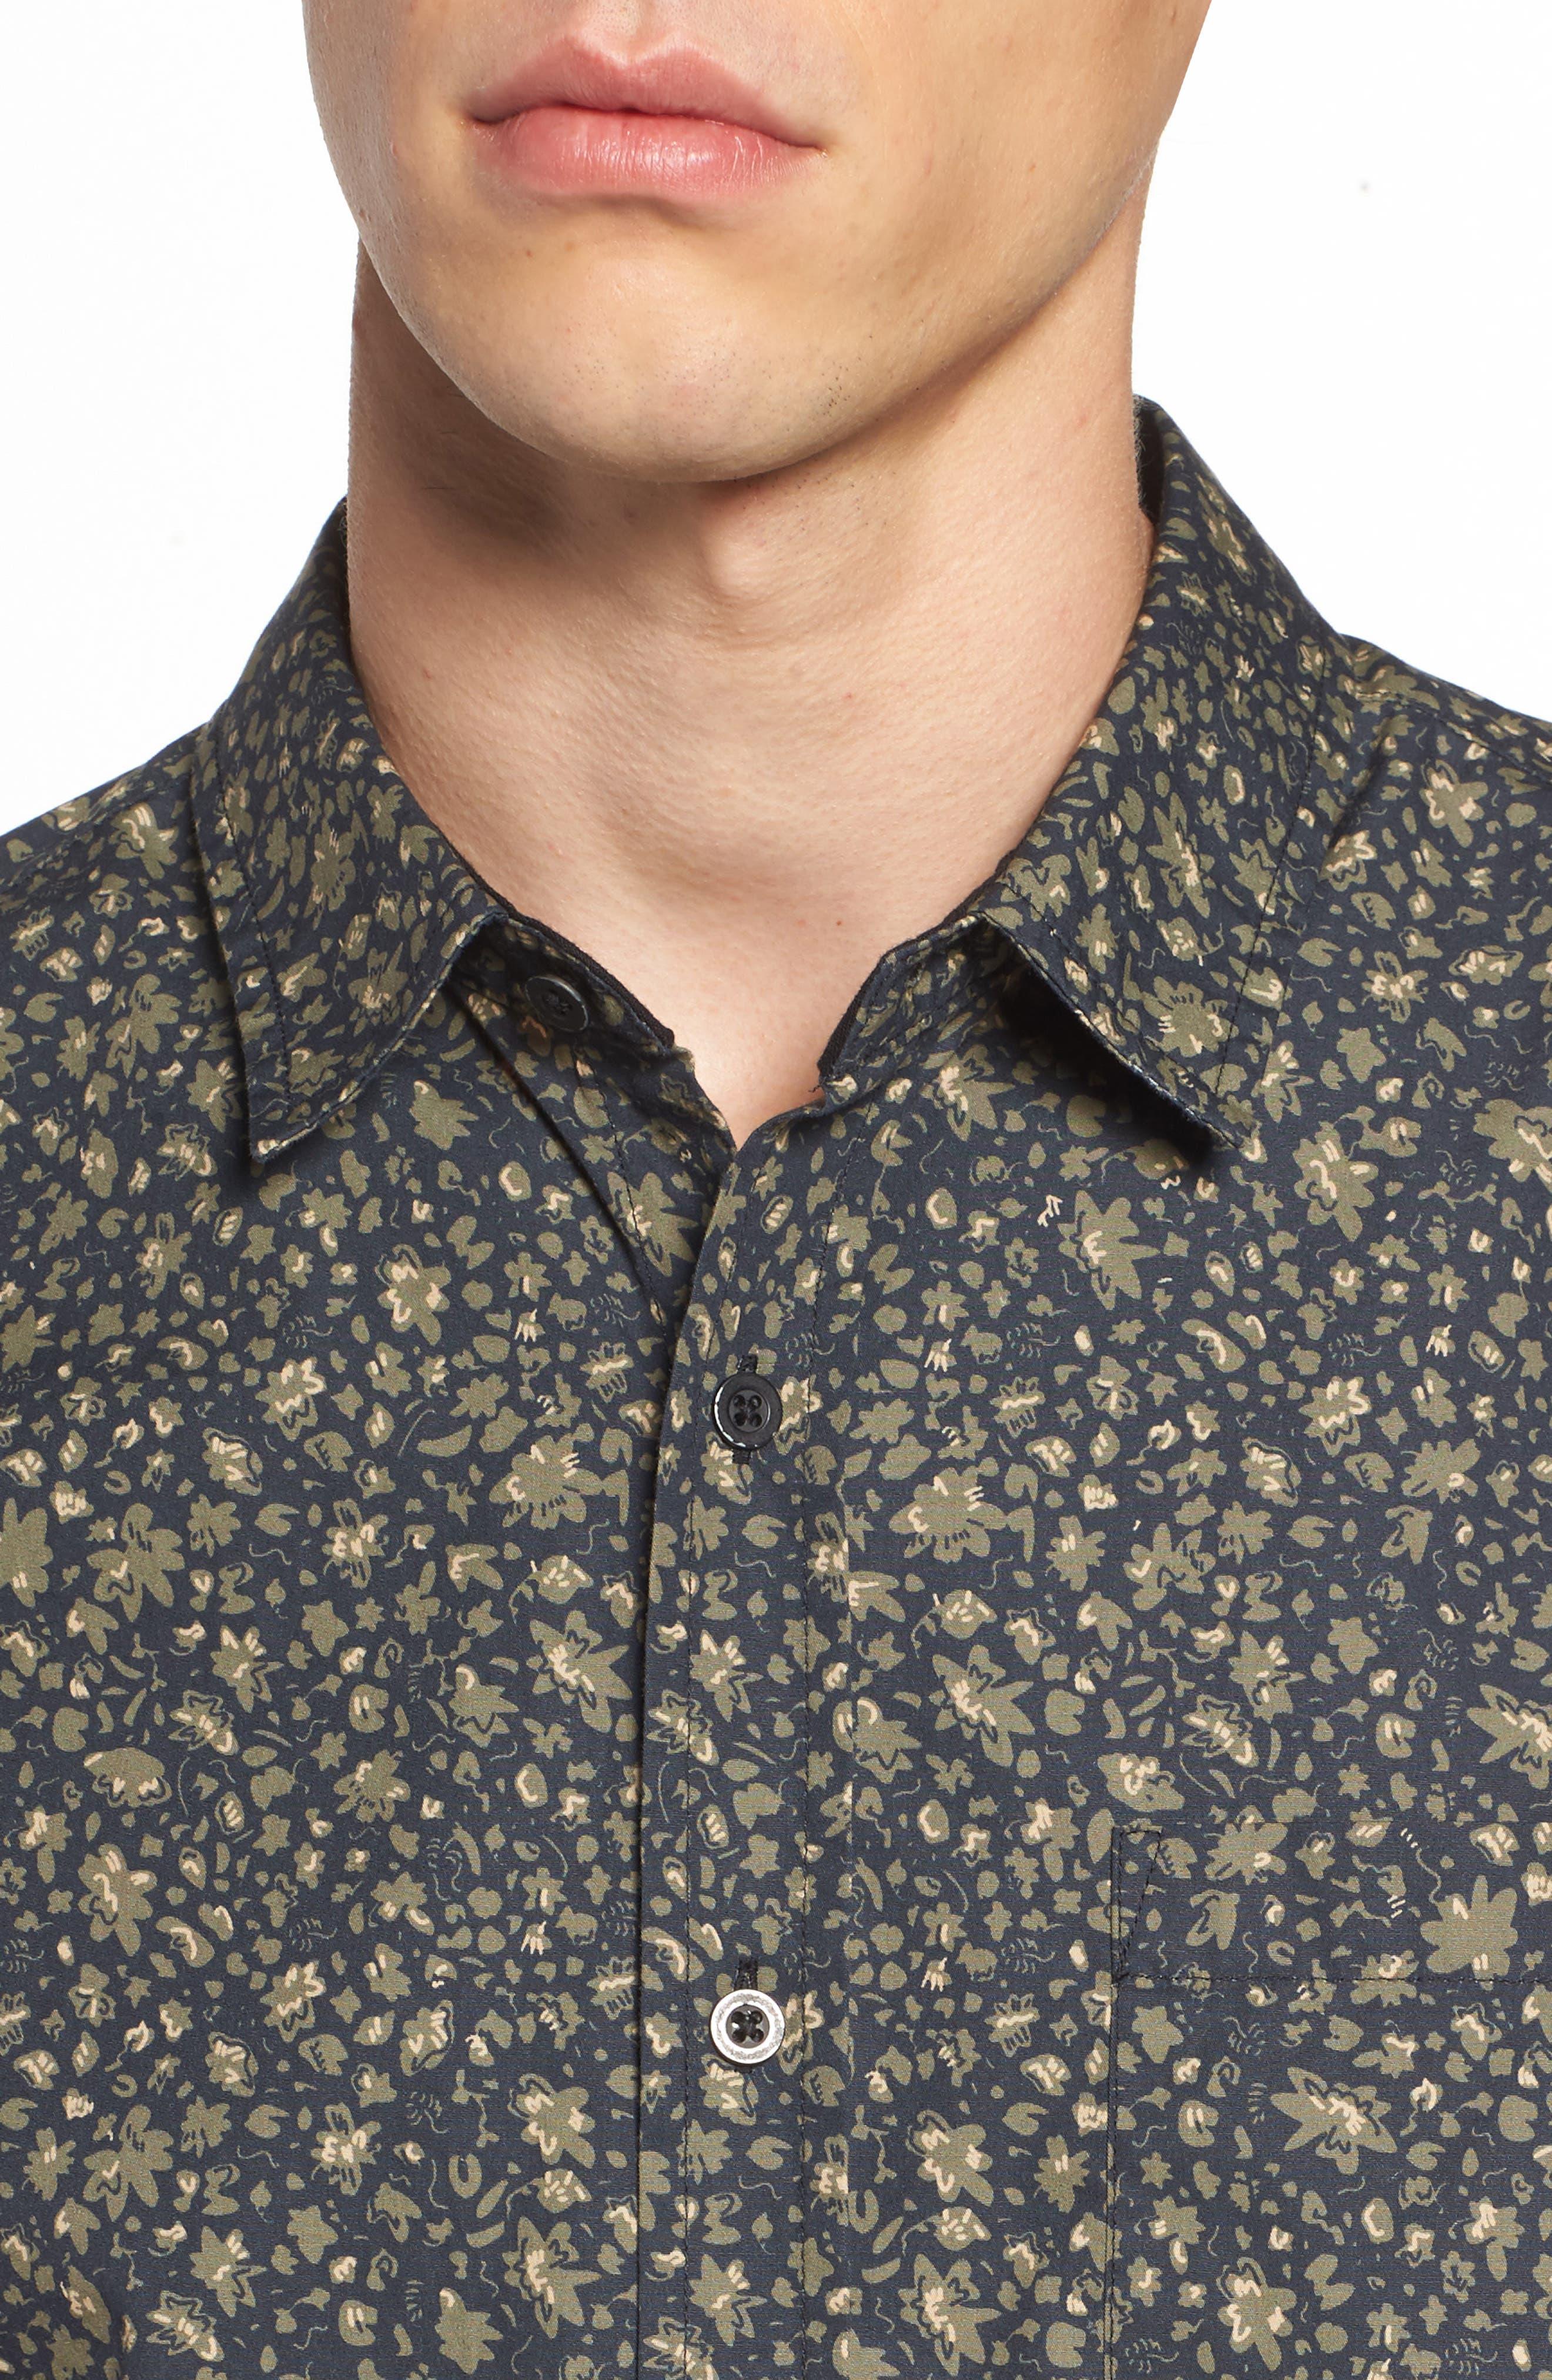 Nash Slim Fit Print Sport Shirt,                             Alternate thumbnail 4, color,                             Floral Camo Black/ Ivy